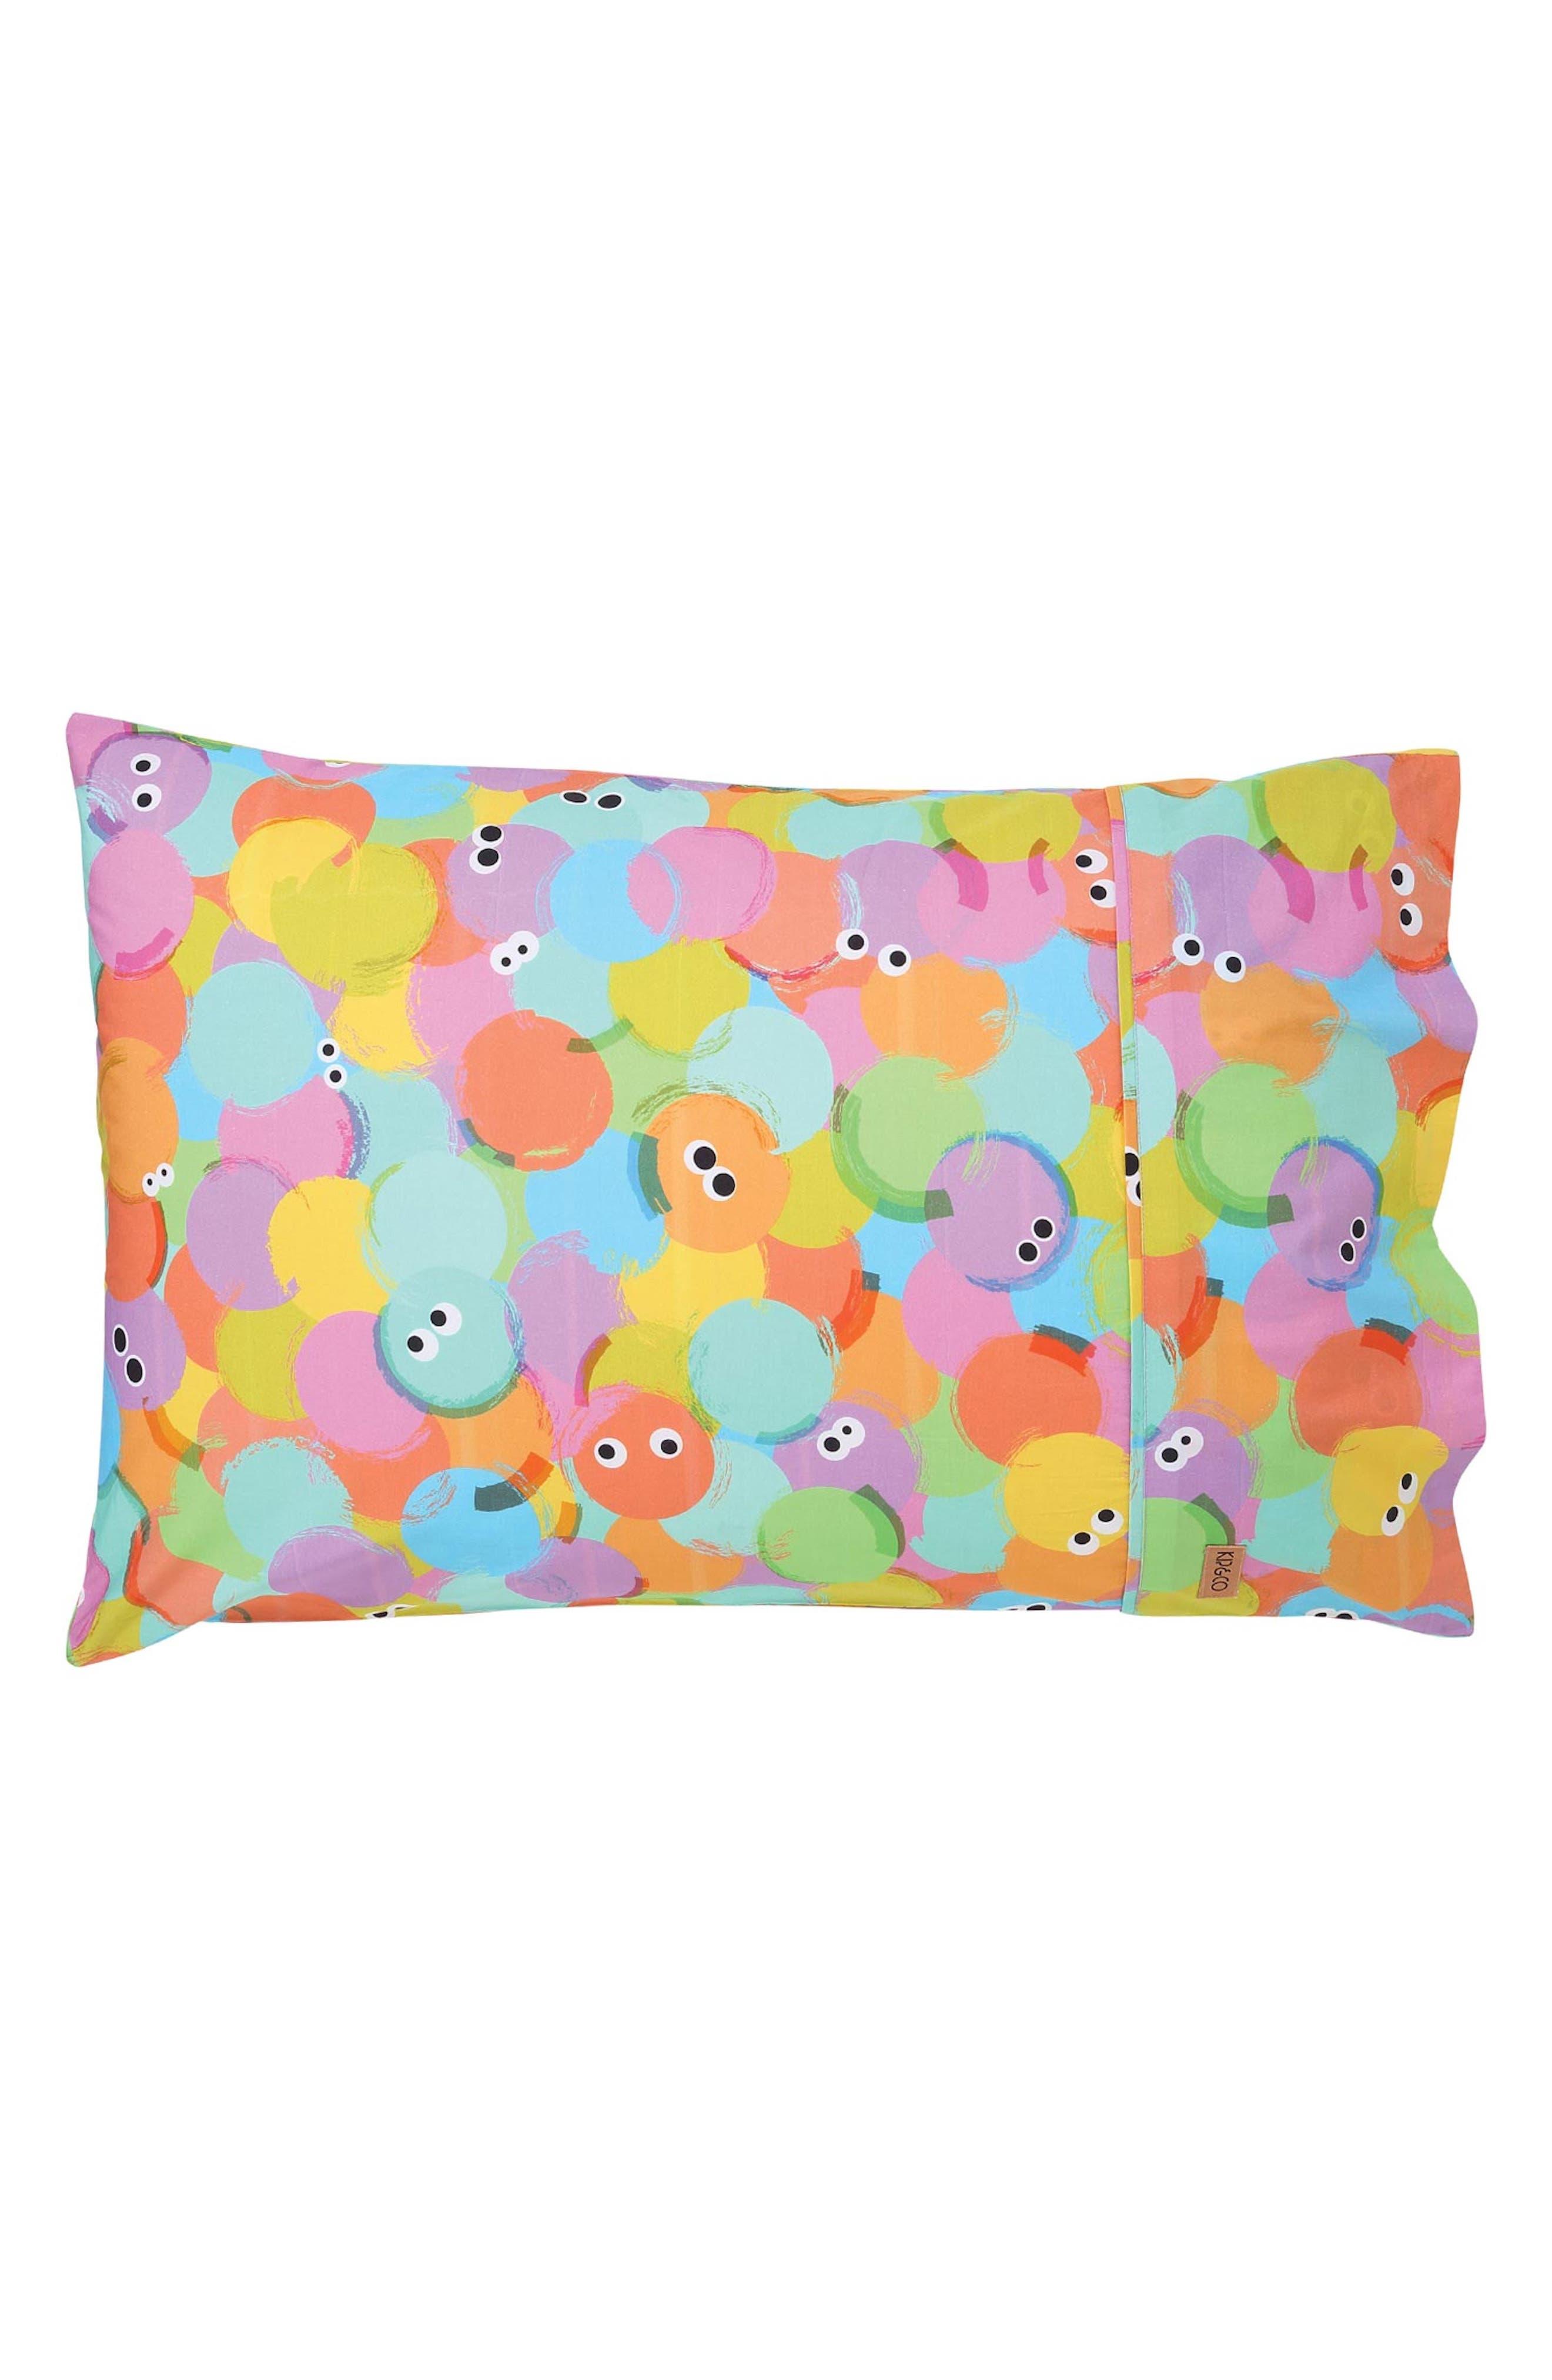 Hello World Cotton Pillowcase,                             Main thumbnail 1, color,                             MULTI